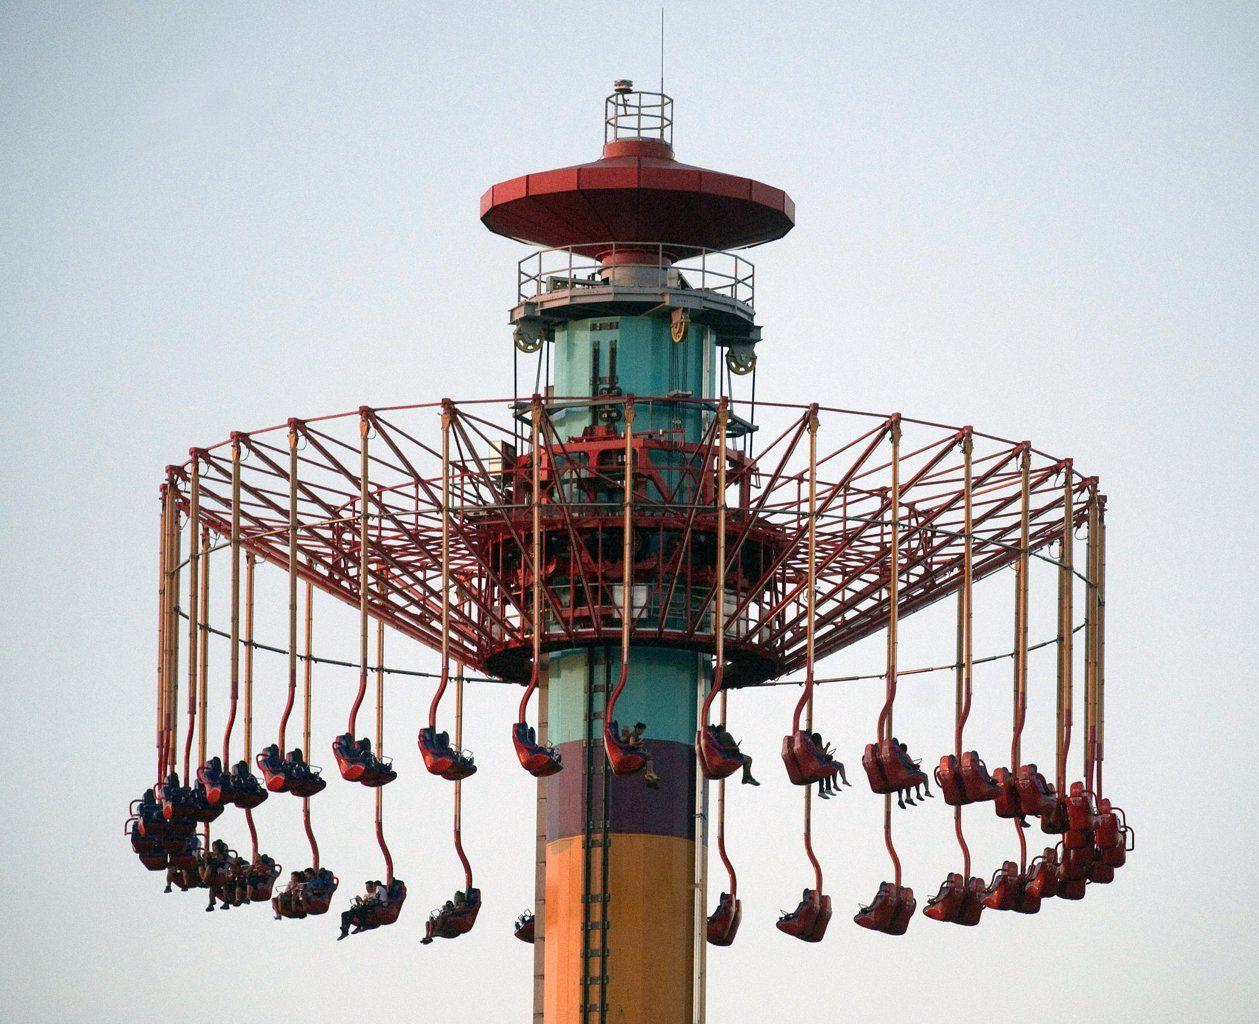 Ca amusement park riders spend hours at  feet  Amusement parks